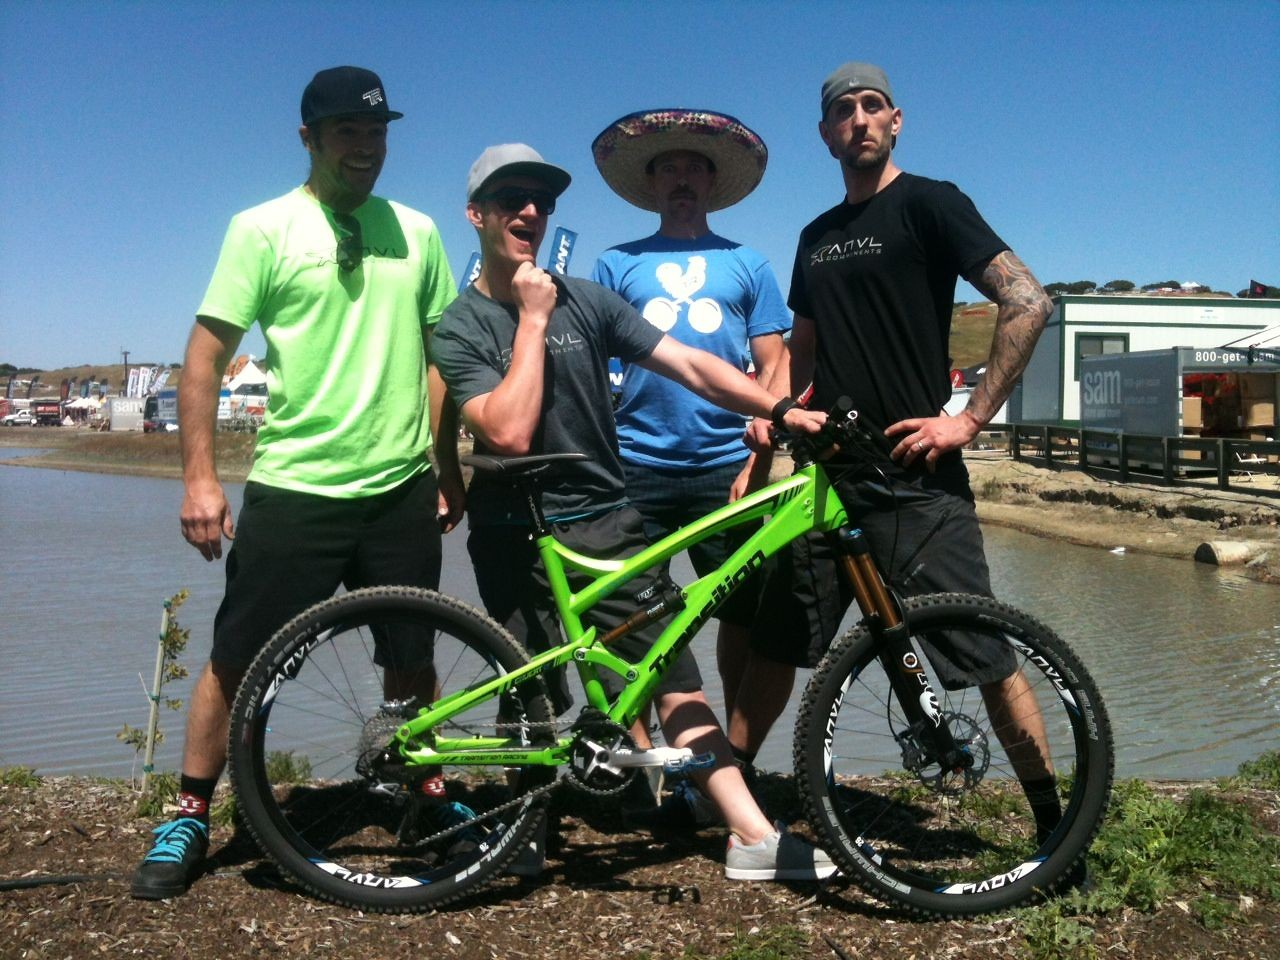 ANVL dudes - iceman2058 - Mountain Biking Pictures - Vital MTB